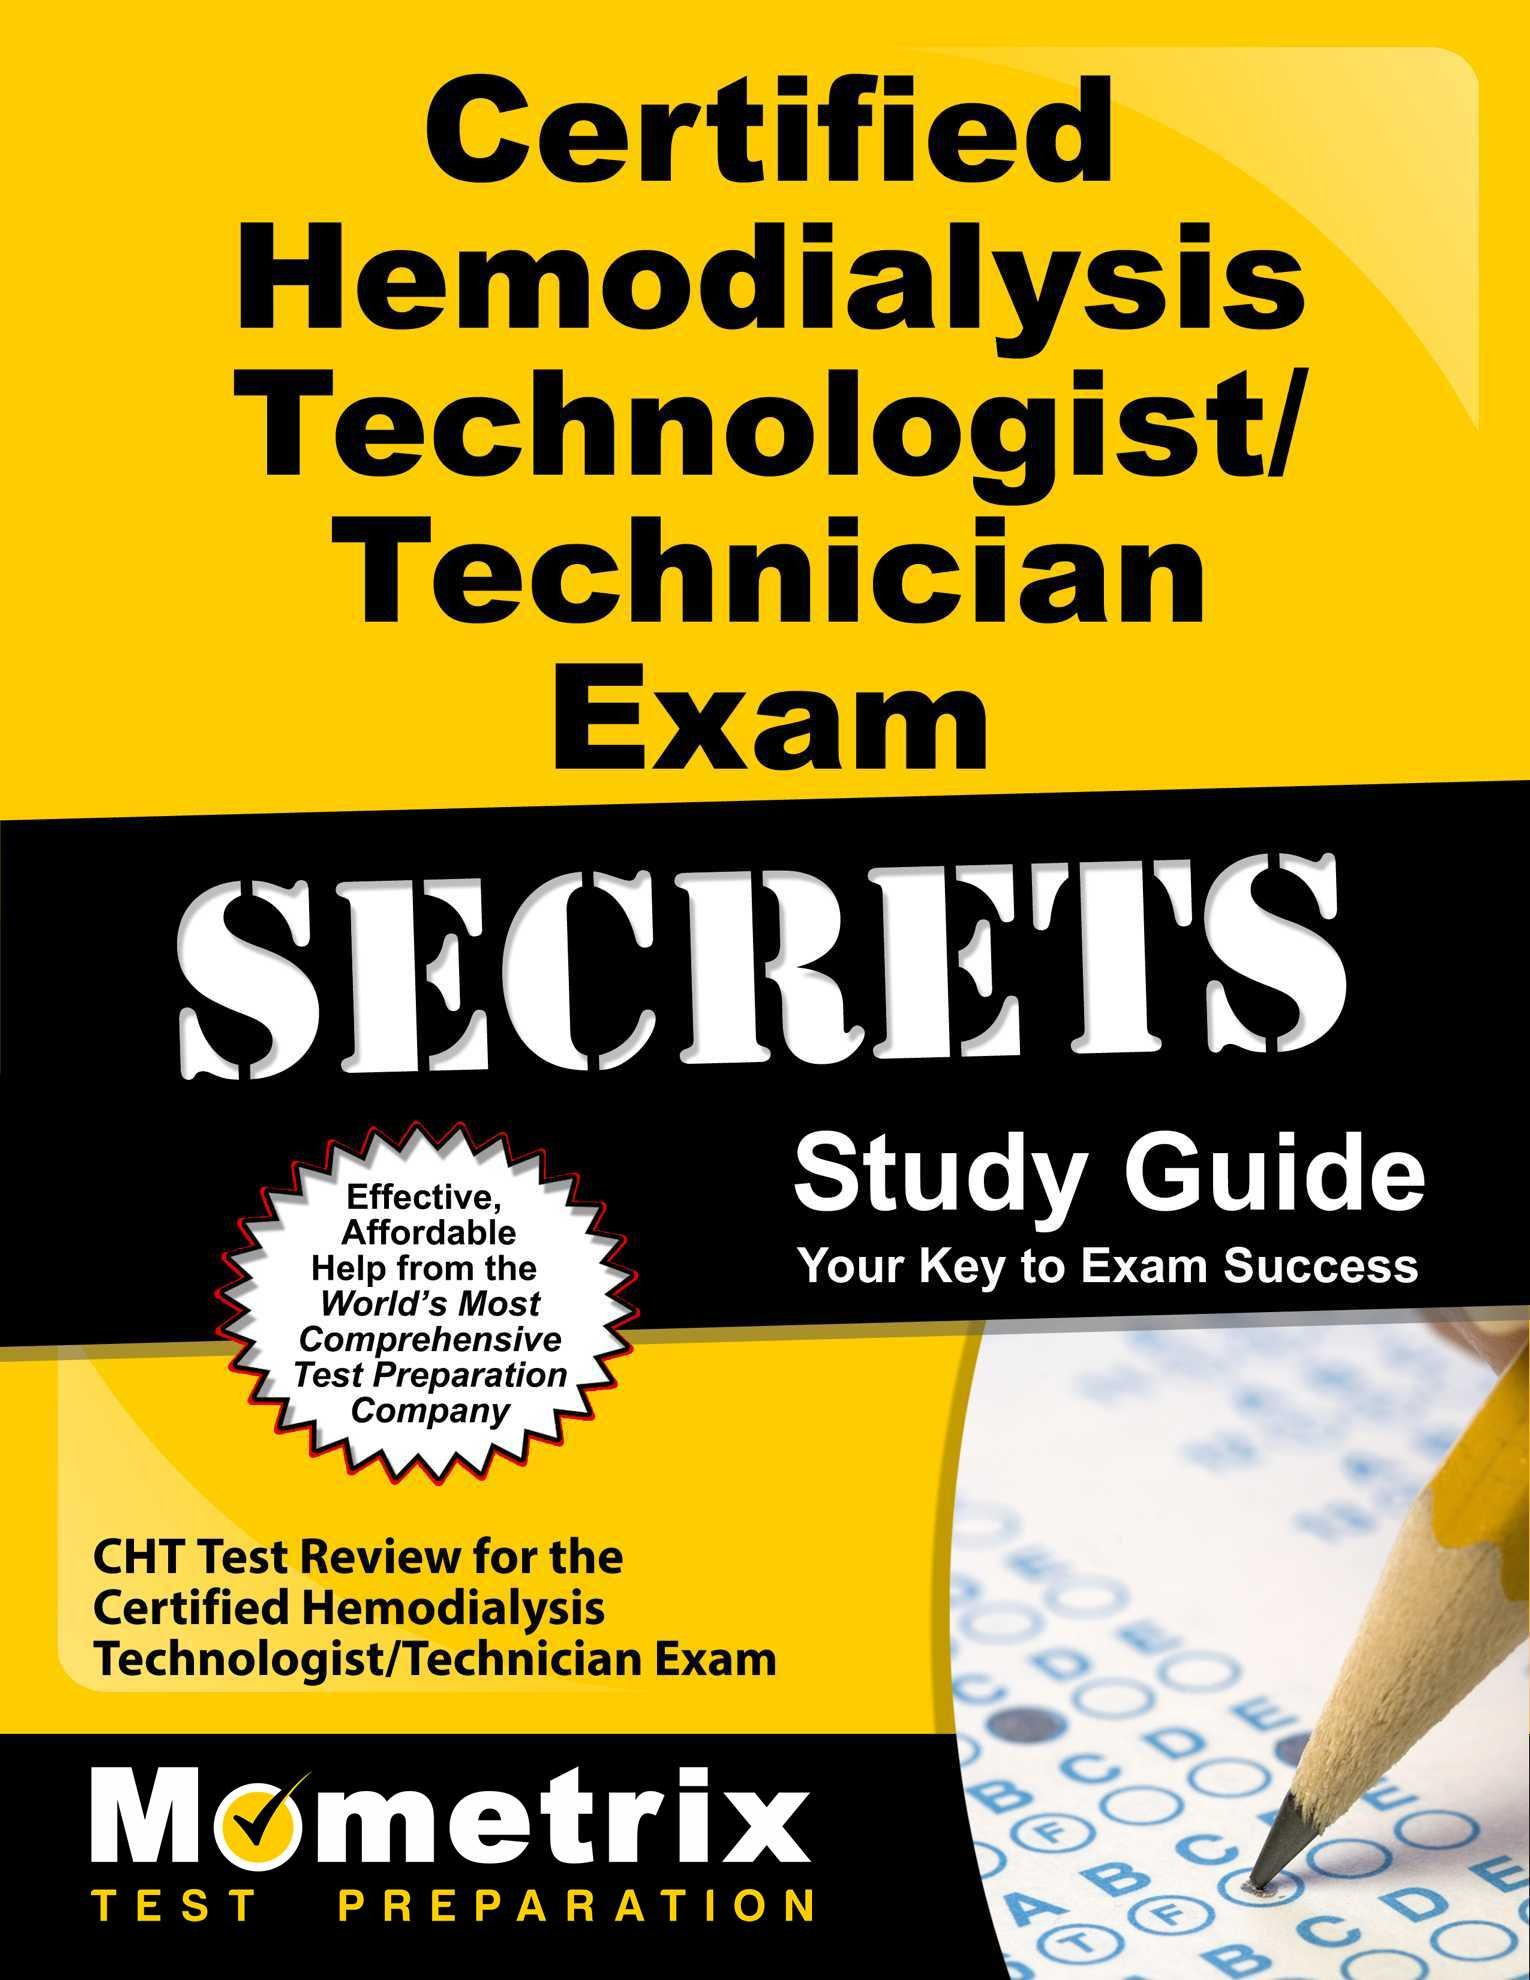 Buy Certified Hemodialysis Technologisttechnician Exam Secrets Cht